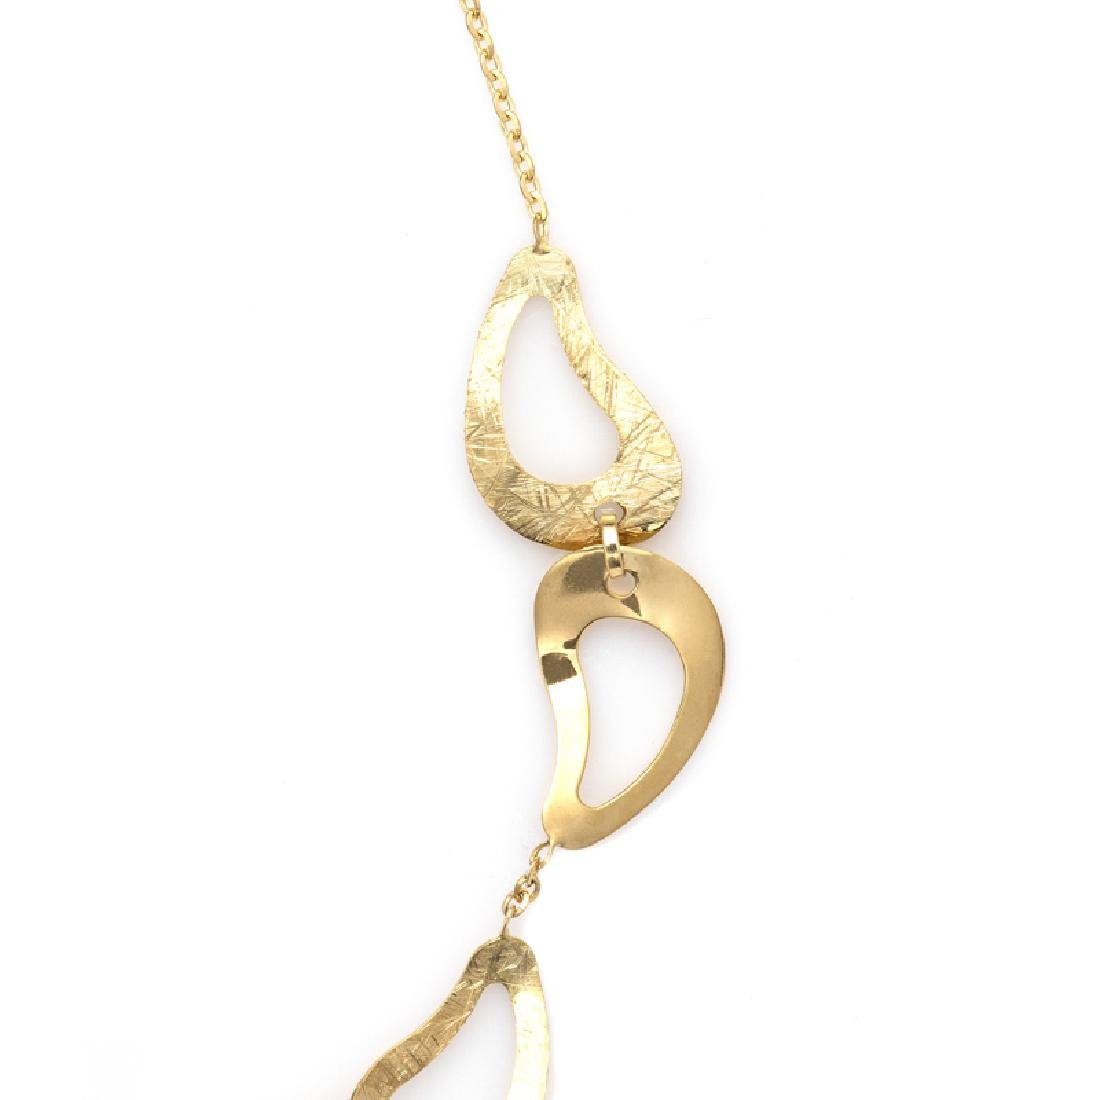 *Fine Jewelry 14 KT Gold, Diamond Cut, Oval Link, - 2